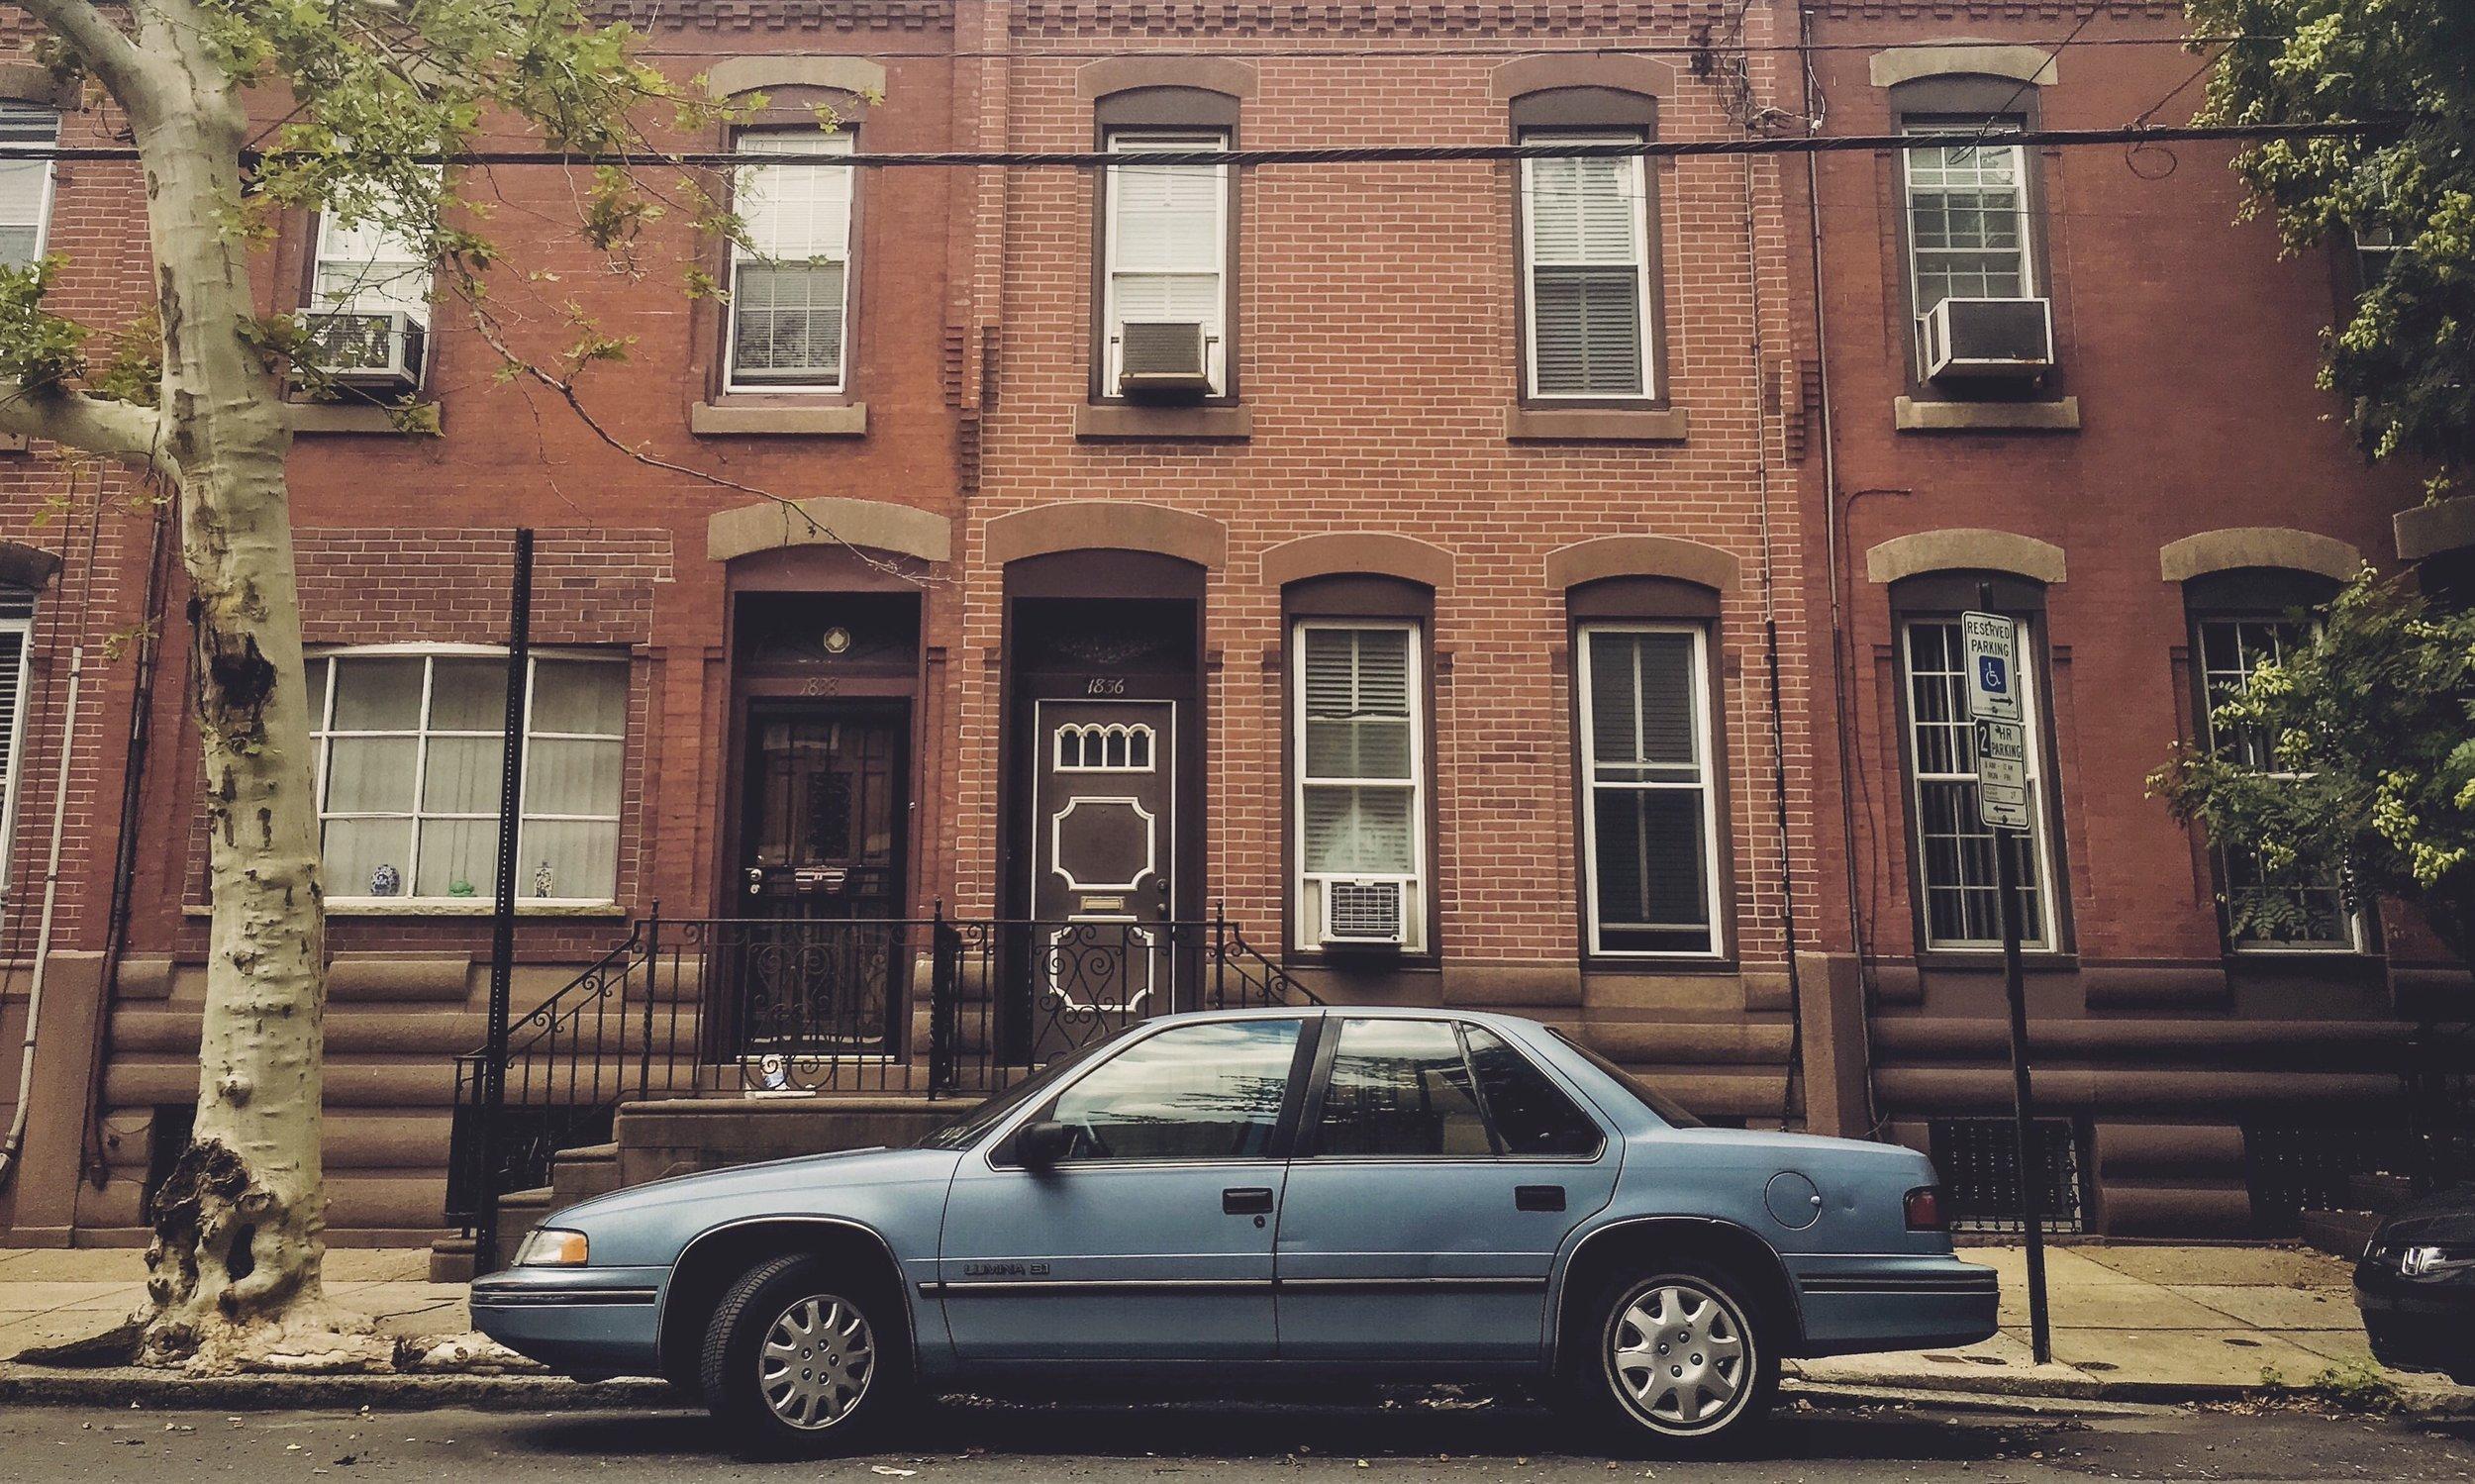 @andrew__king - South Philadelphia, PA